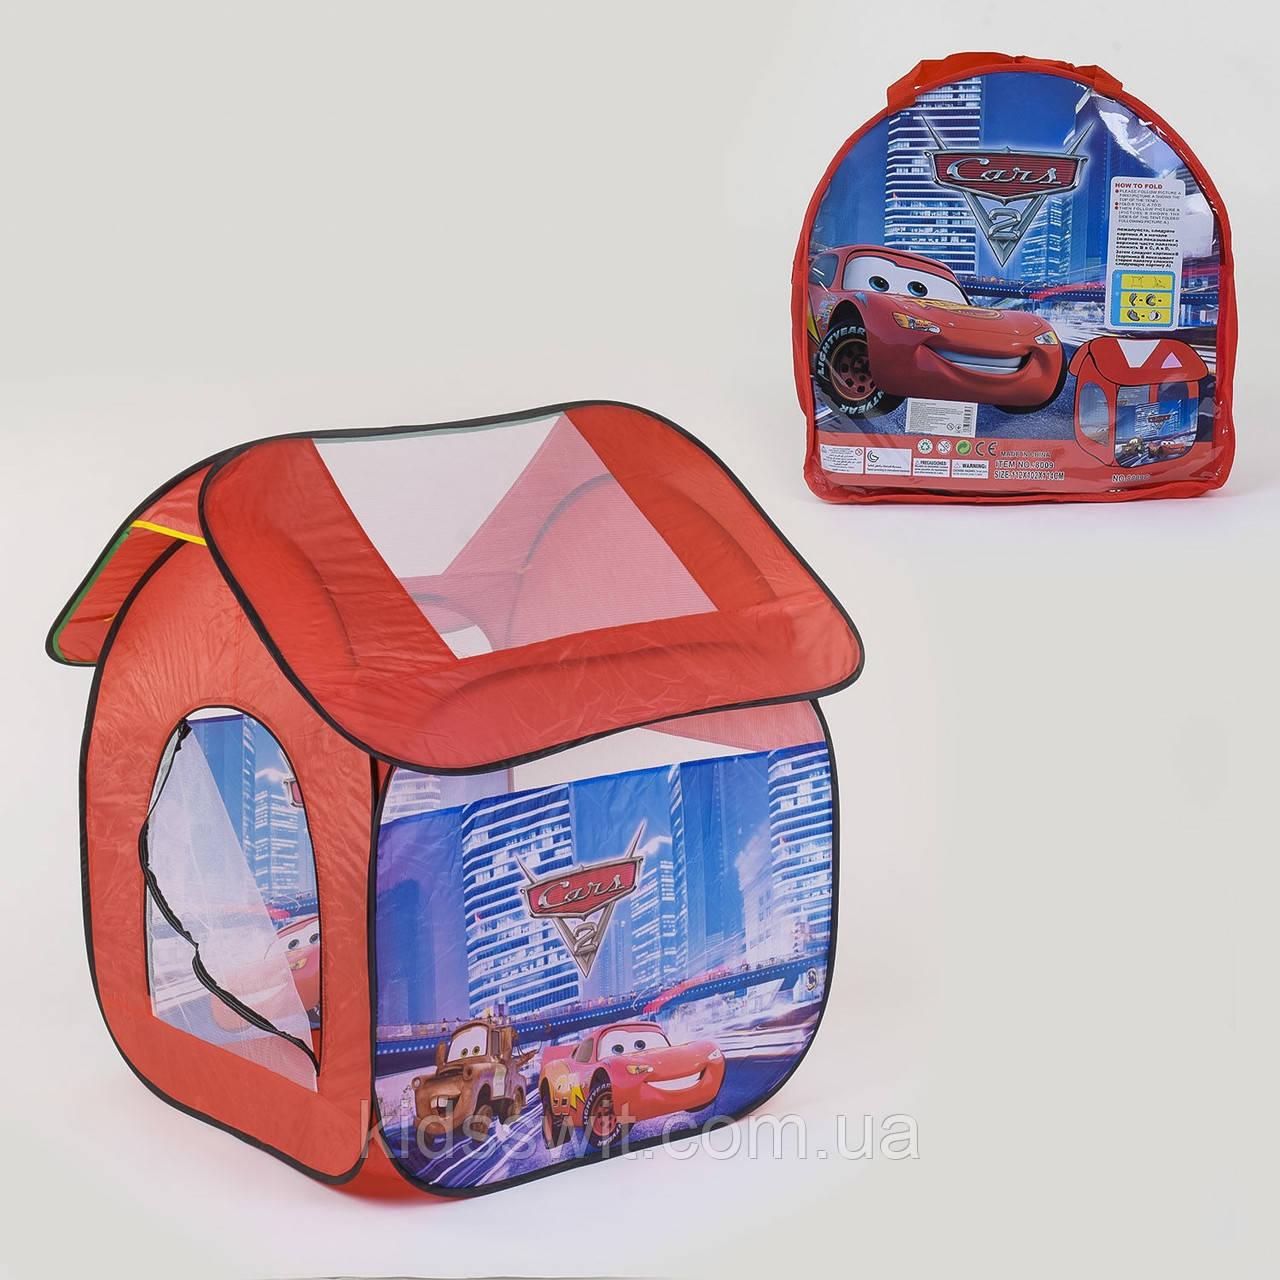 Палатка детская Машинки 112 х102 х114 см, в сумке 8009 C